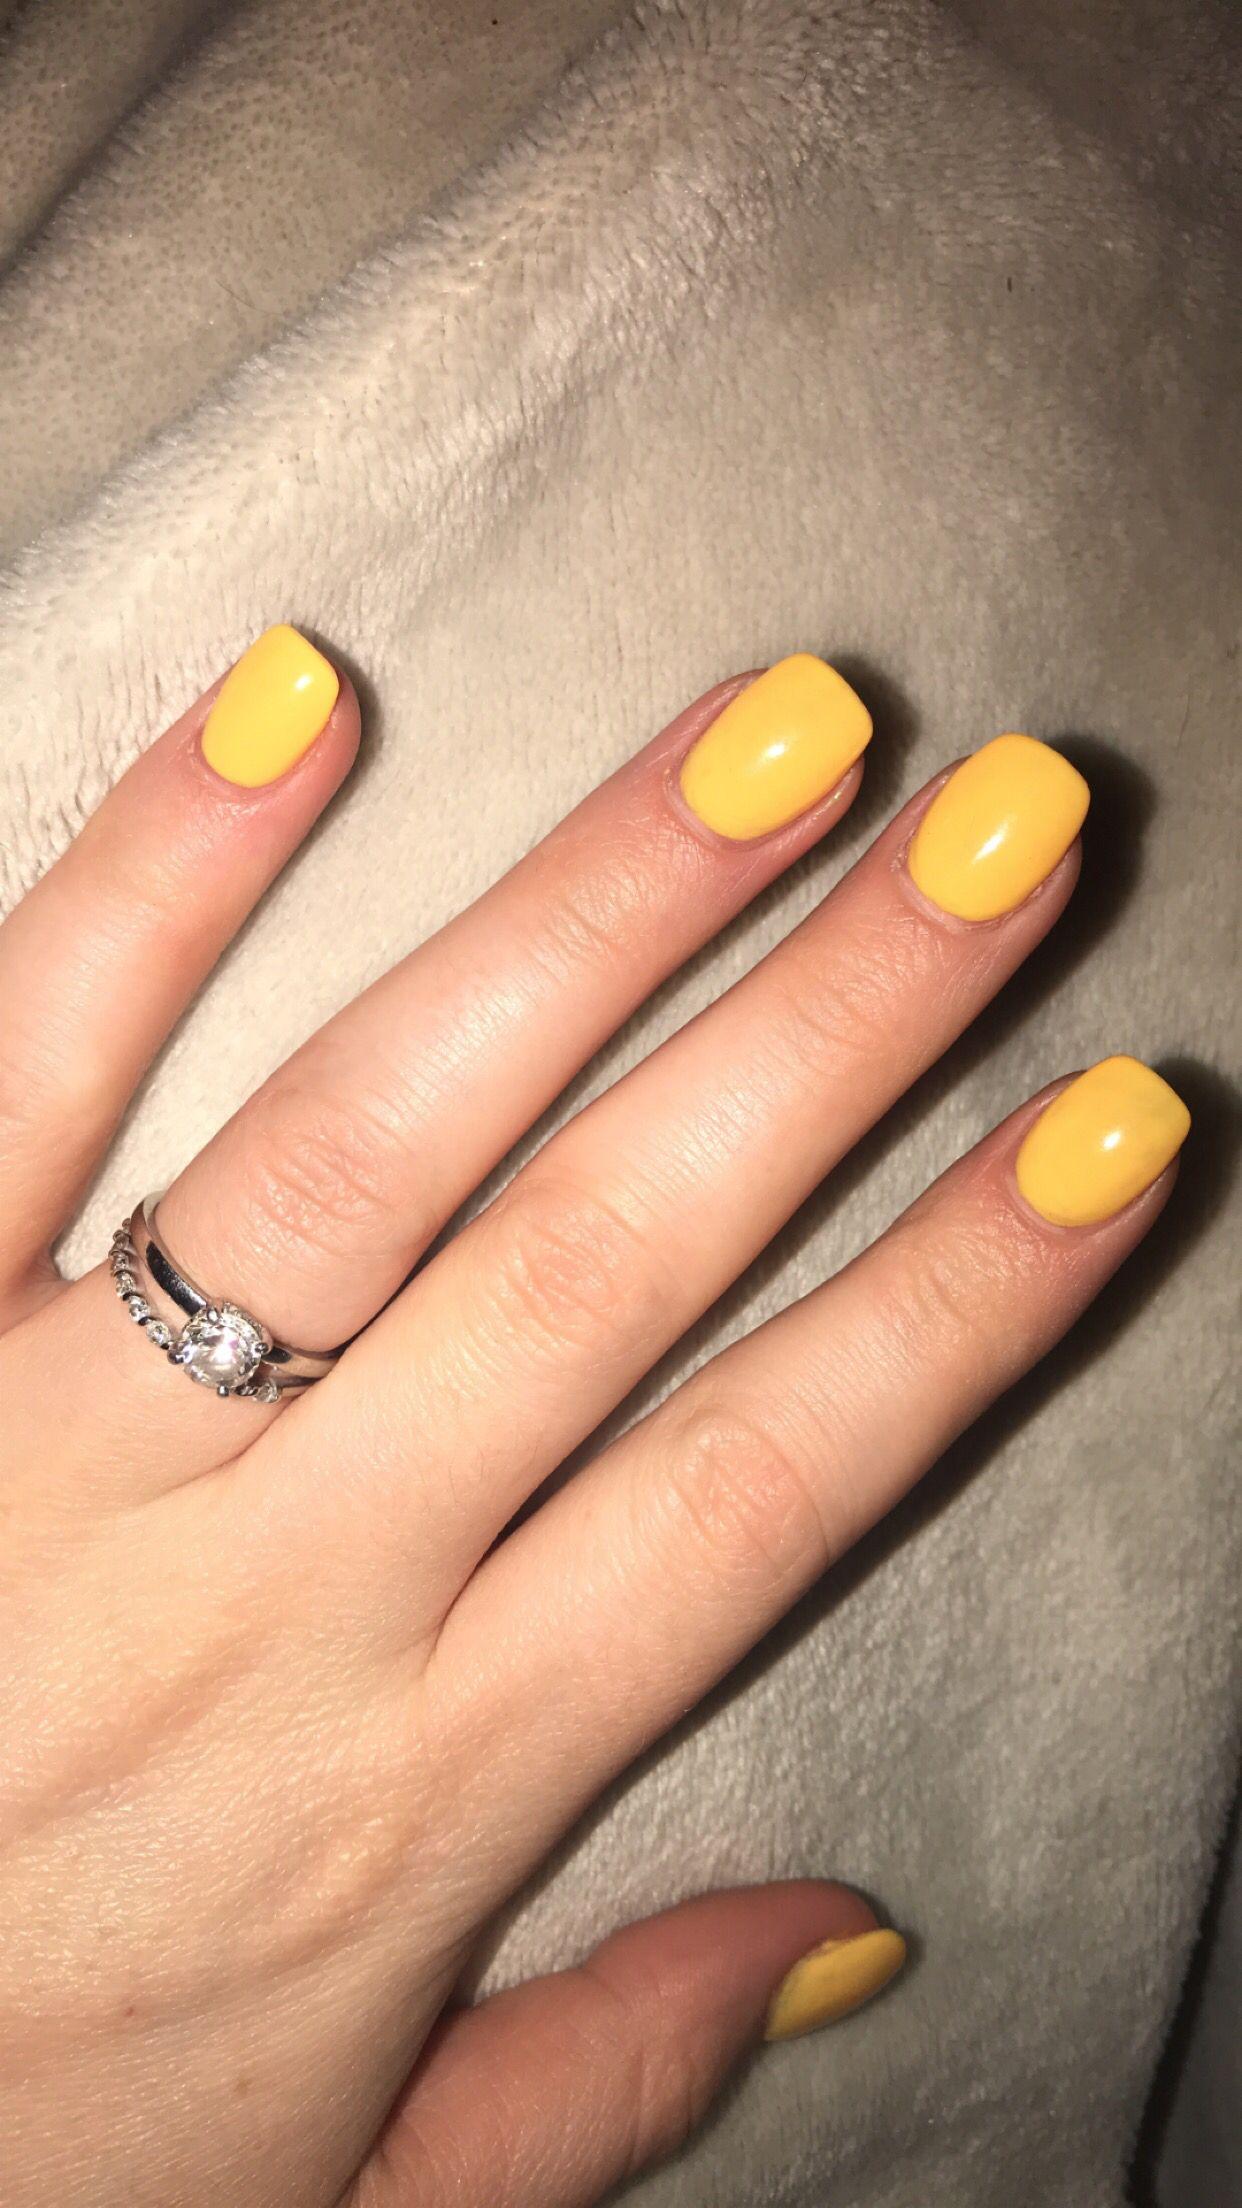 Yellow Acrylic Nails Short Square Round Short Square Acrylic